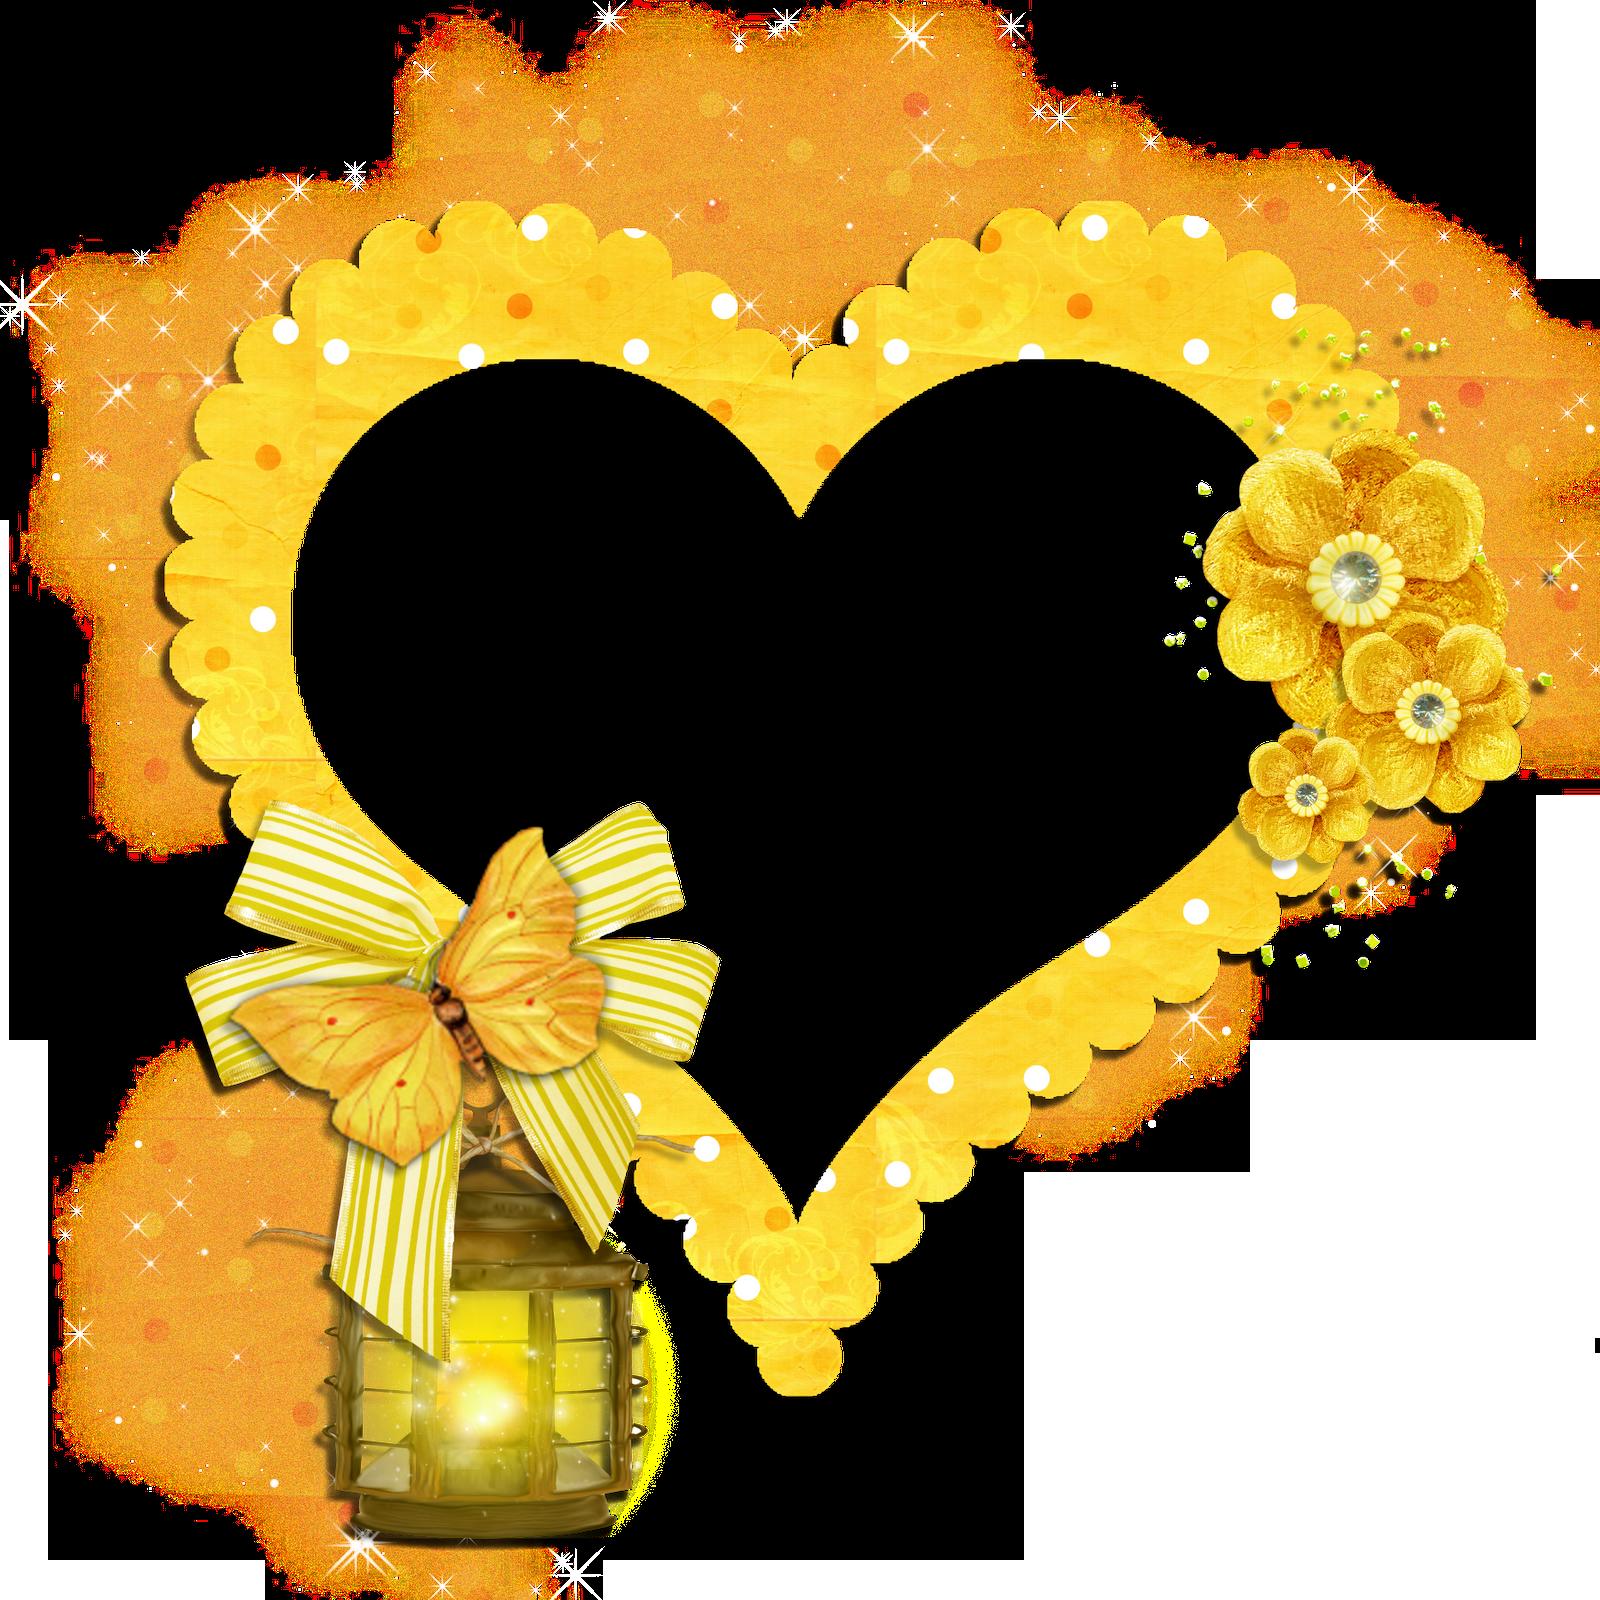 Frame Heart Images Image Symbols Yellow Heart